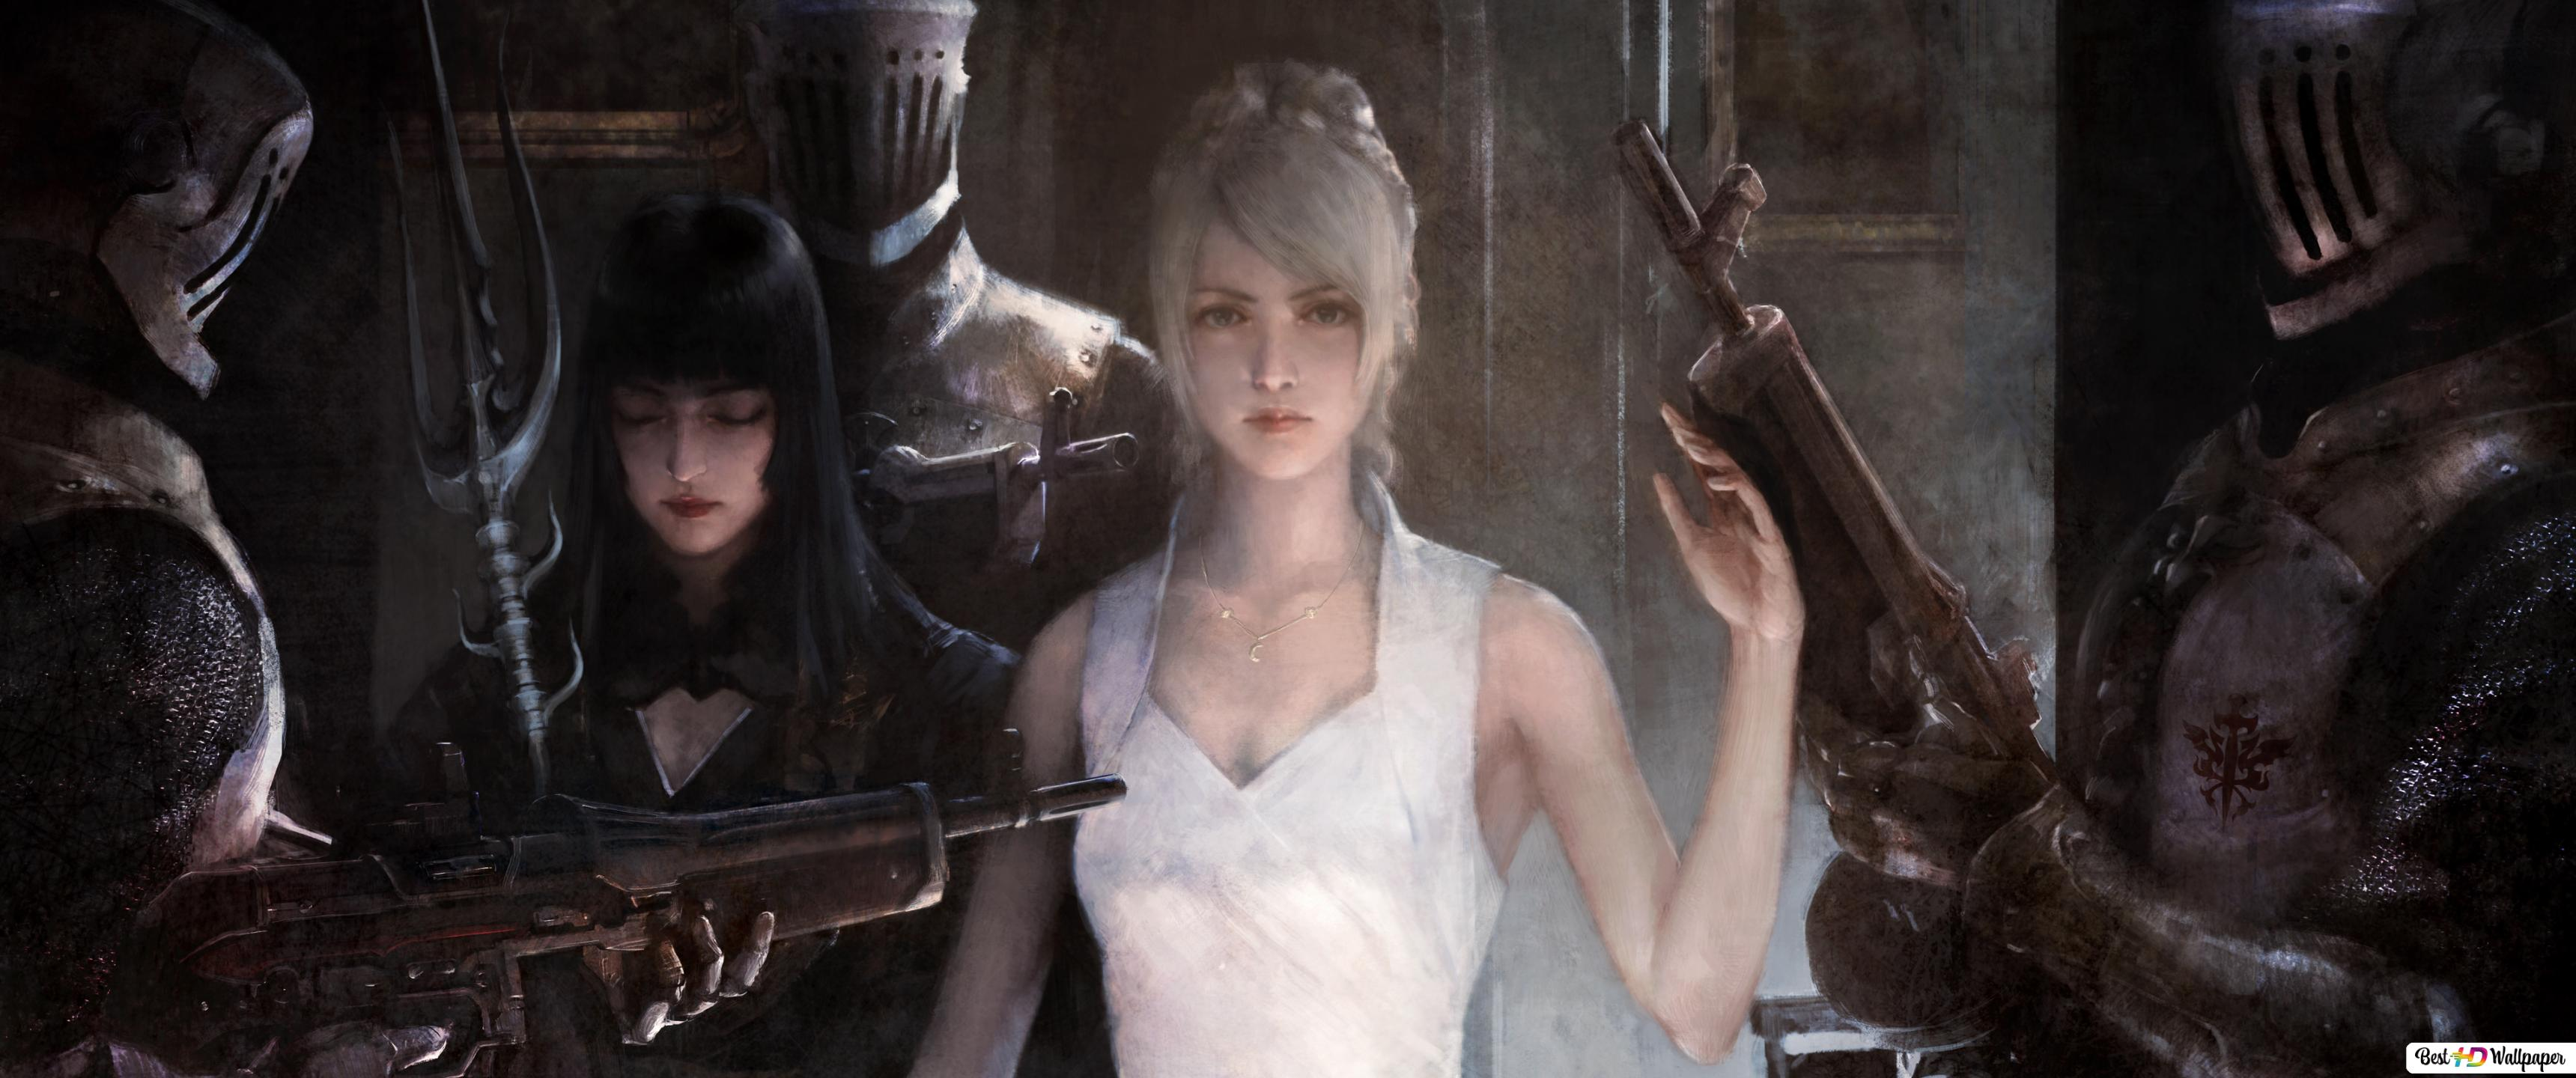 Final Fantasy Xv Luna Hd Wallpaper Download